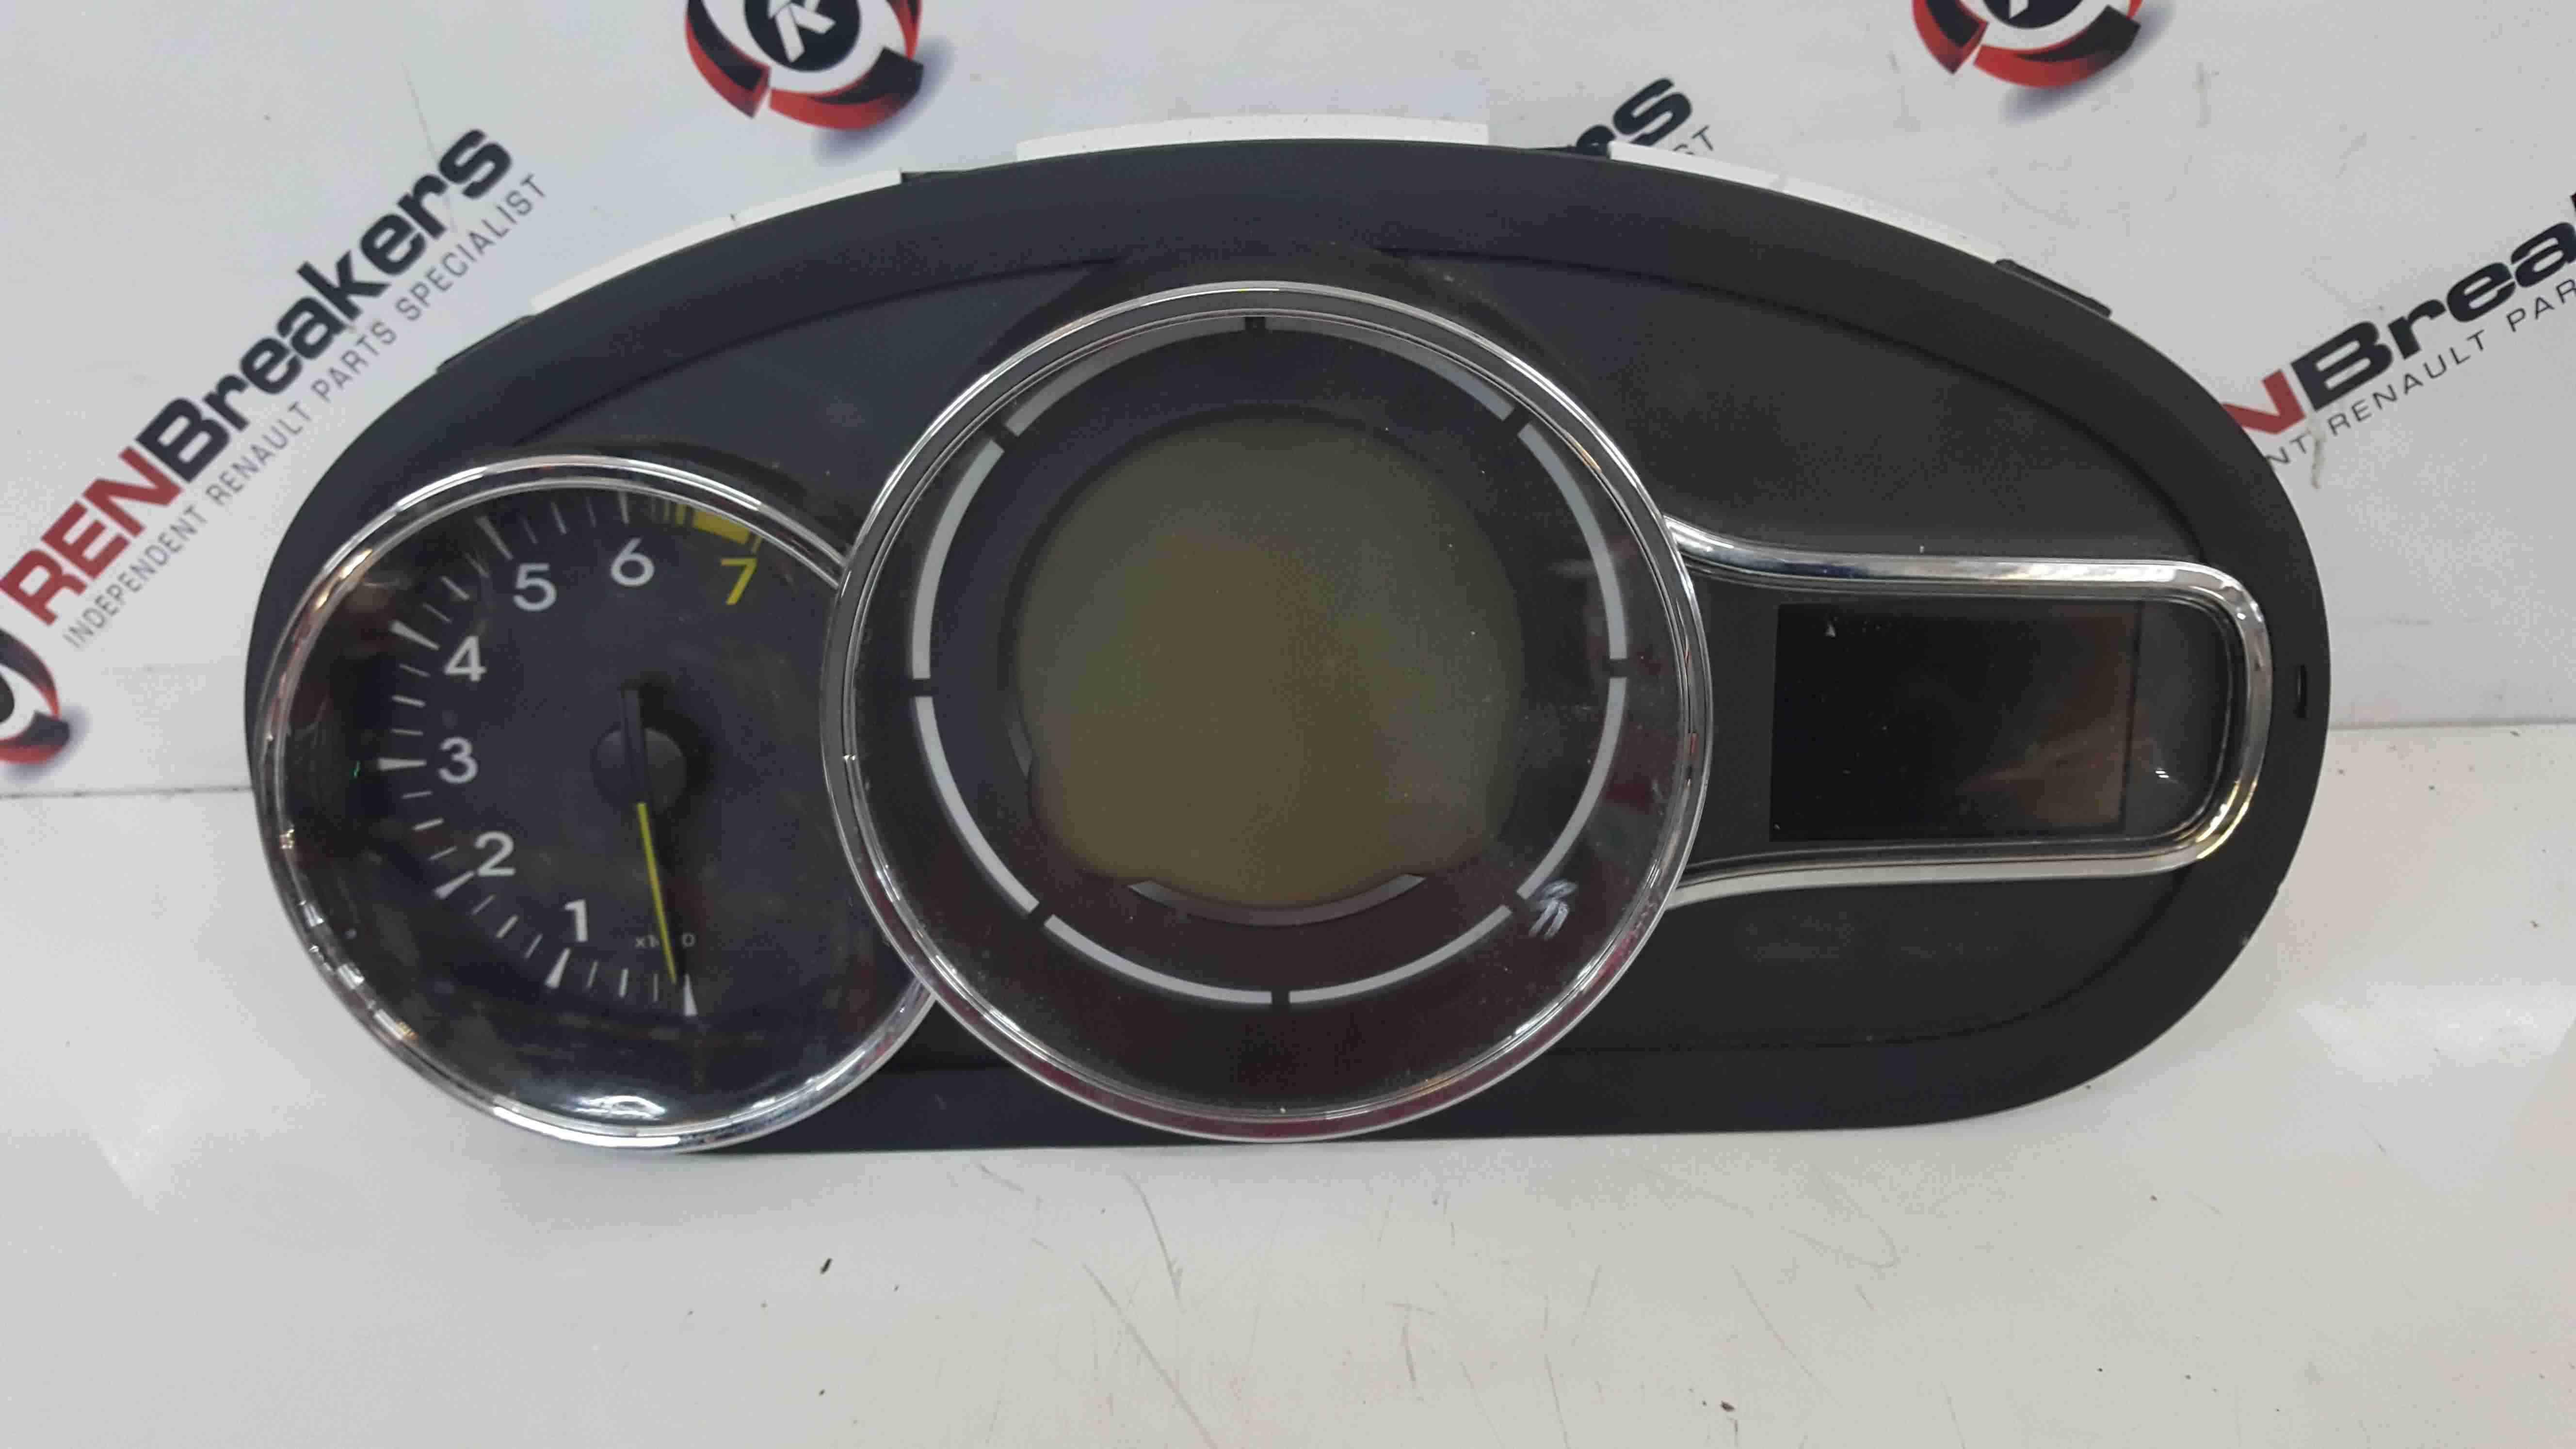 Renault Megane MK3 2008-2014 Instrument Panel Dials Clocks 90K 248100053R